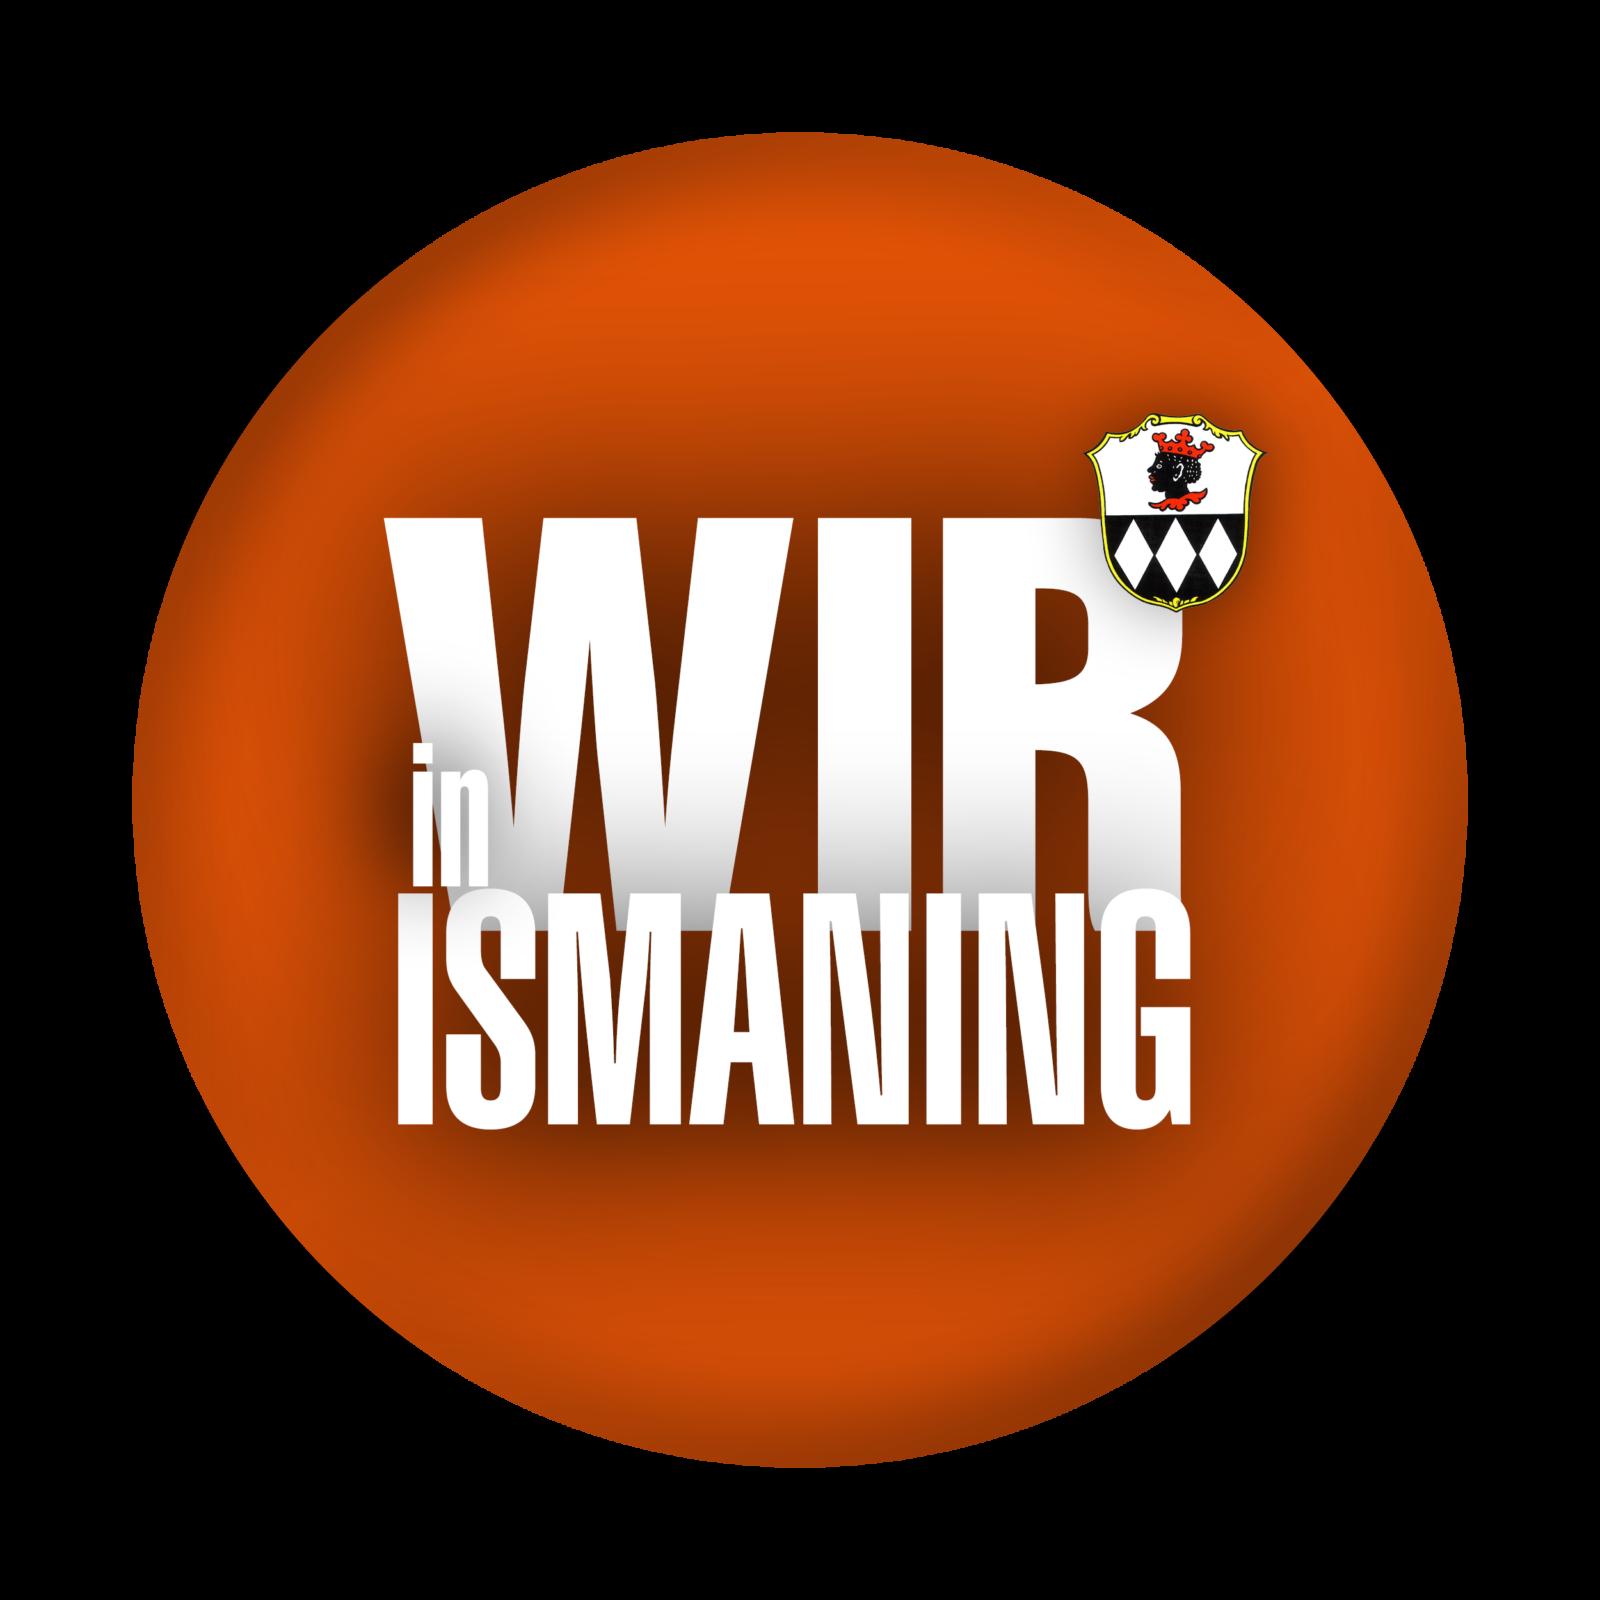 wir-in-ismaning_logo_rgb-2500x2500px.png